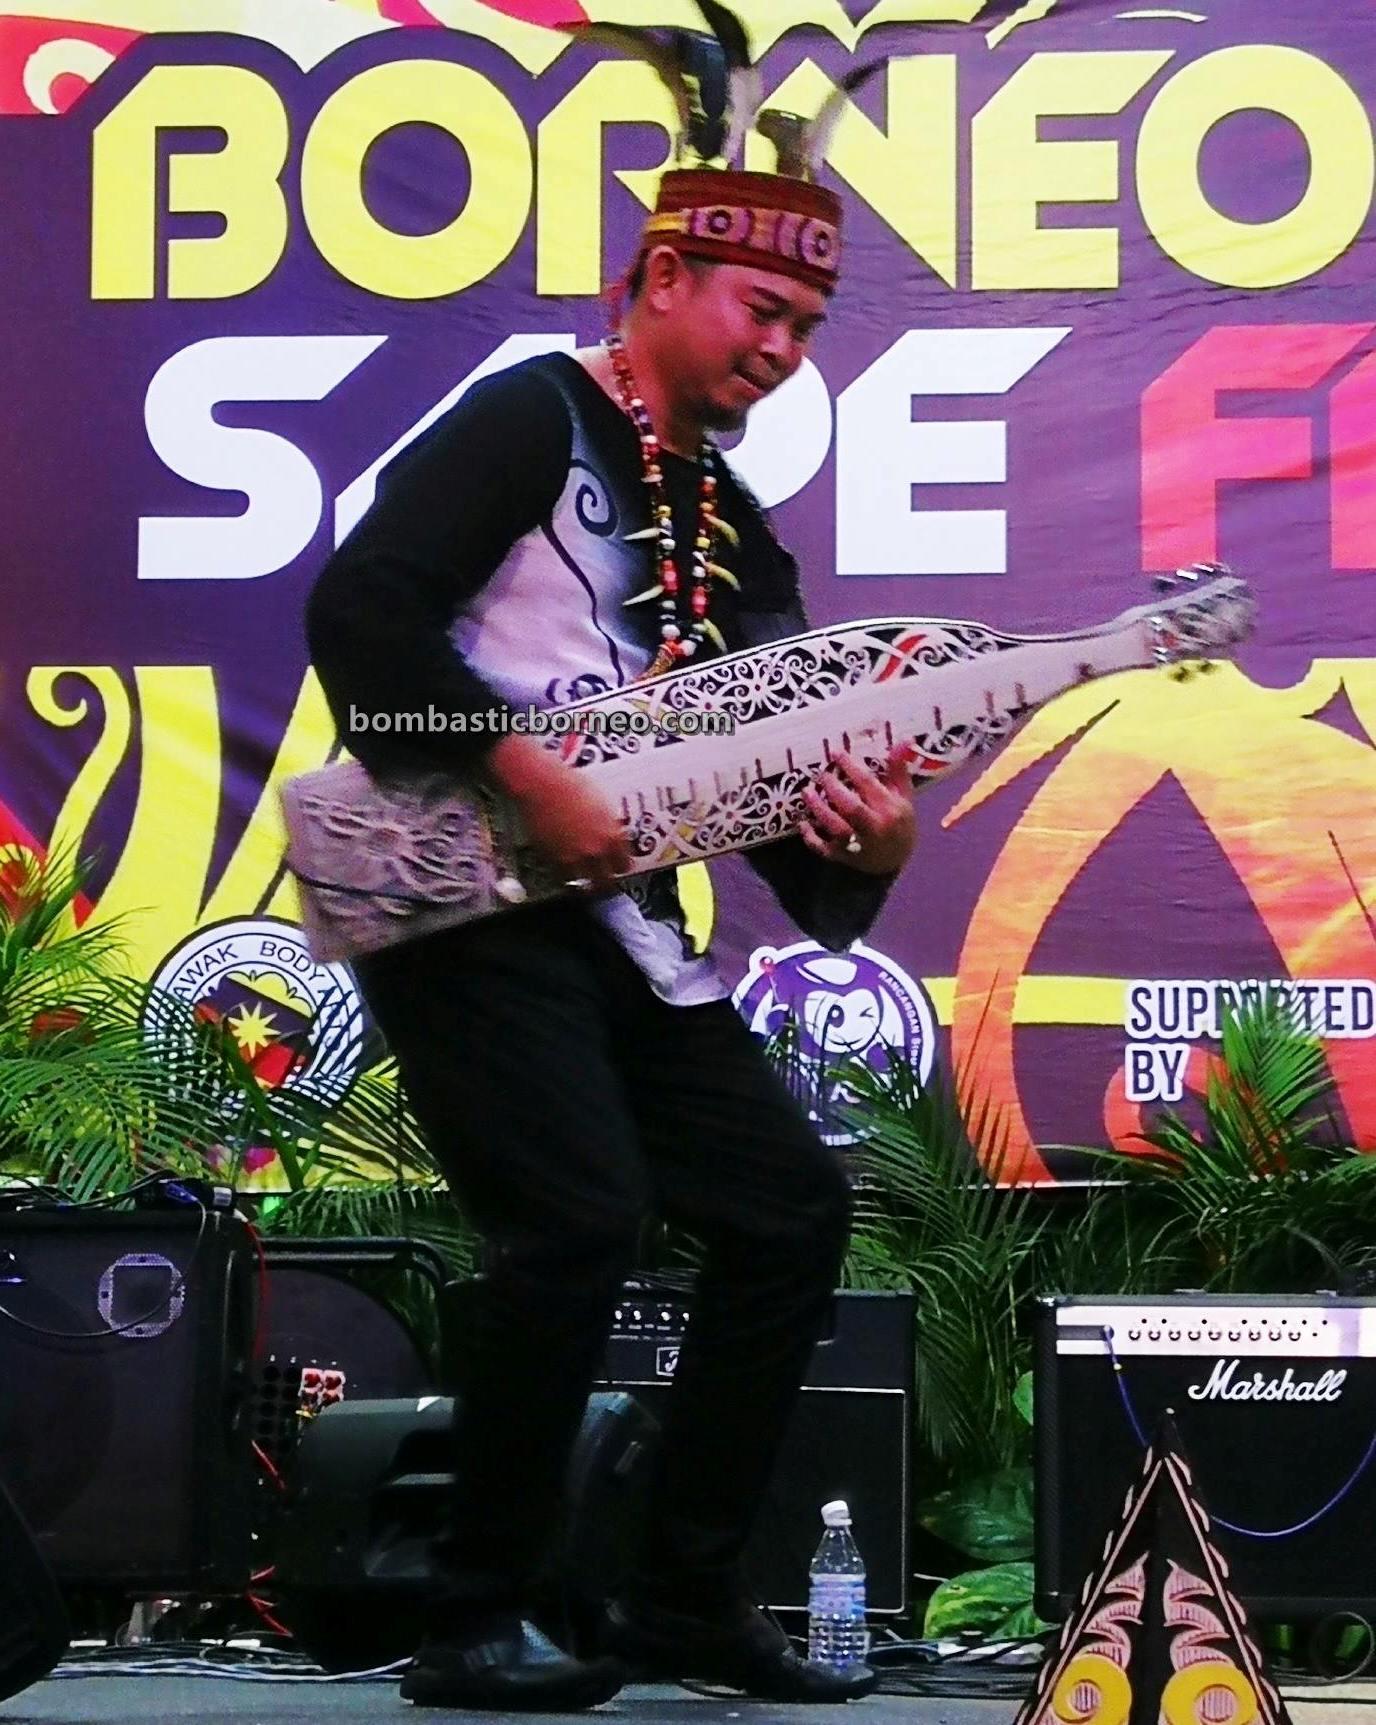 guitar, Youth Sape Festival, traditional, culture, event, native, tribal, indigenous, musical instrument, Tourism, tourist attraction, travel guide, cross border, 婆罗洲达雅吉他, 砂拉越音乐文化, 马来西亚原住民沙贝